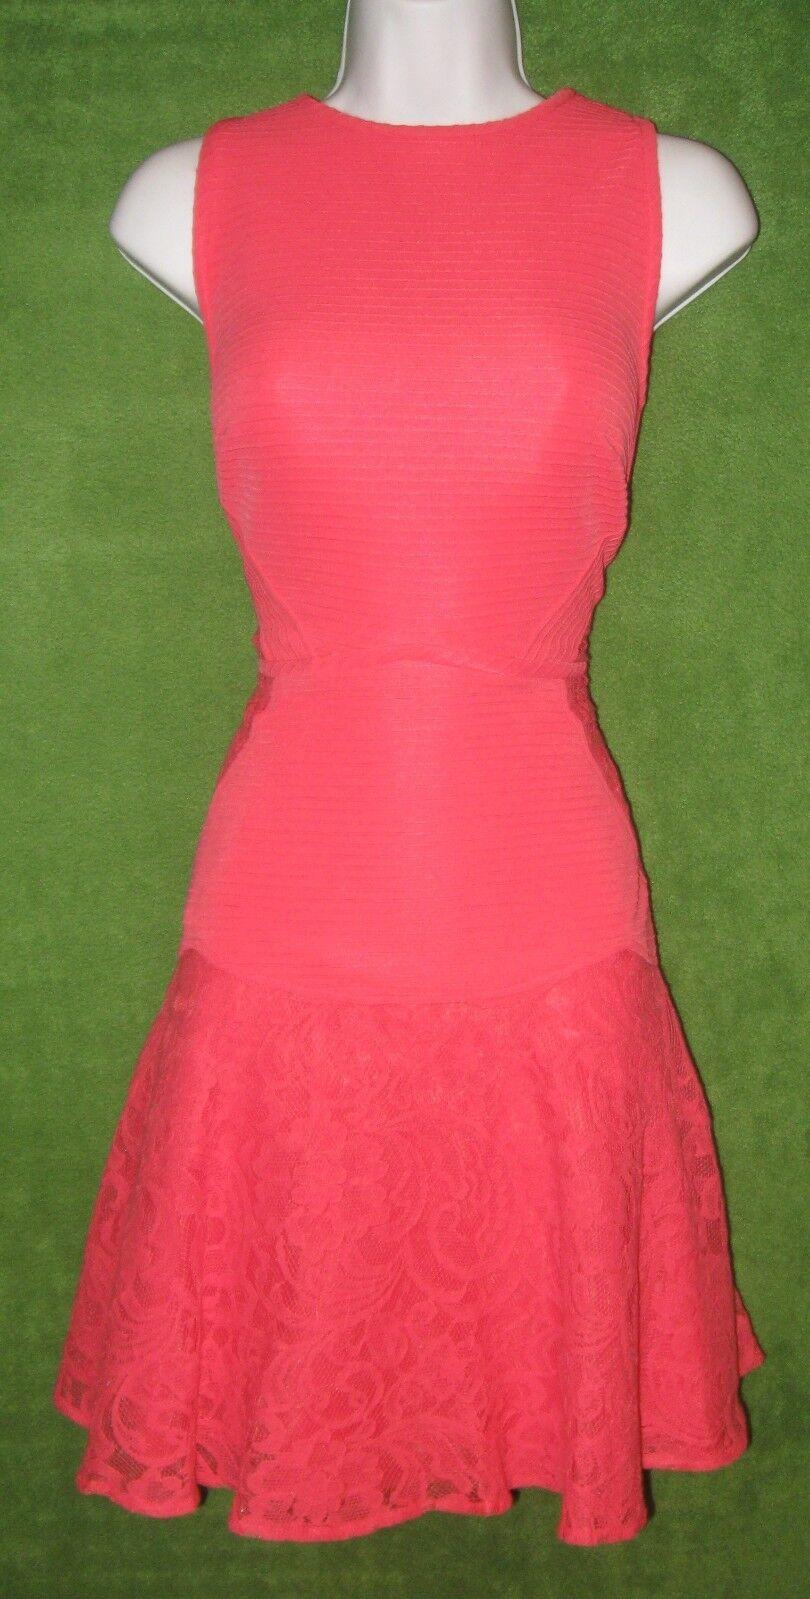 Julia Julia Julia Jordan Bright Melon Ribbed Knit Cotton Lace Social Dress 4  160 MISC 8124f0